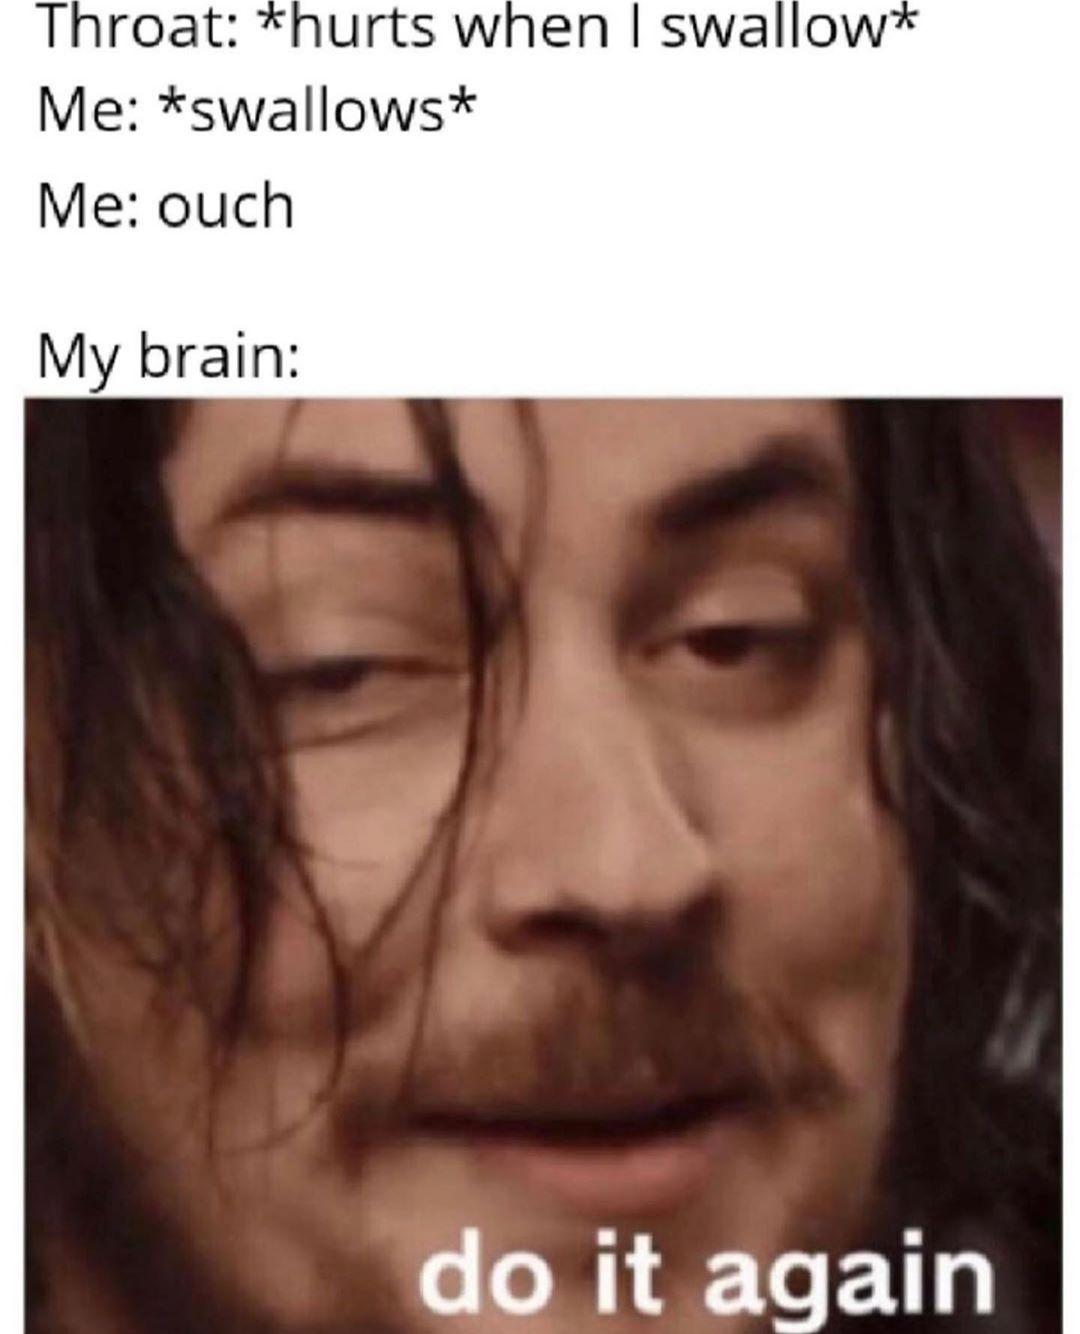 Meme S Quotes Memes Its Memes Laughing Memes Memes Quotes Funnie Memes I Meme Truthful Memes Really Funny Memes Funny Relatable Memes Stupid Funny Memes